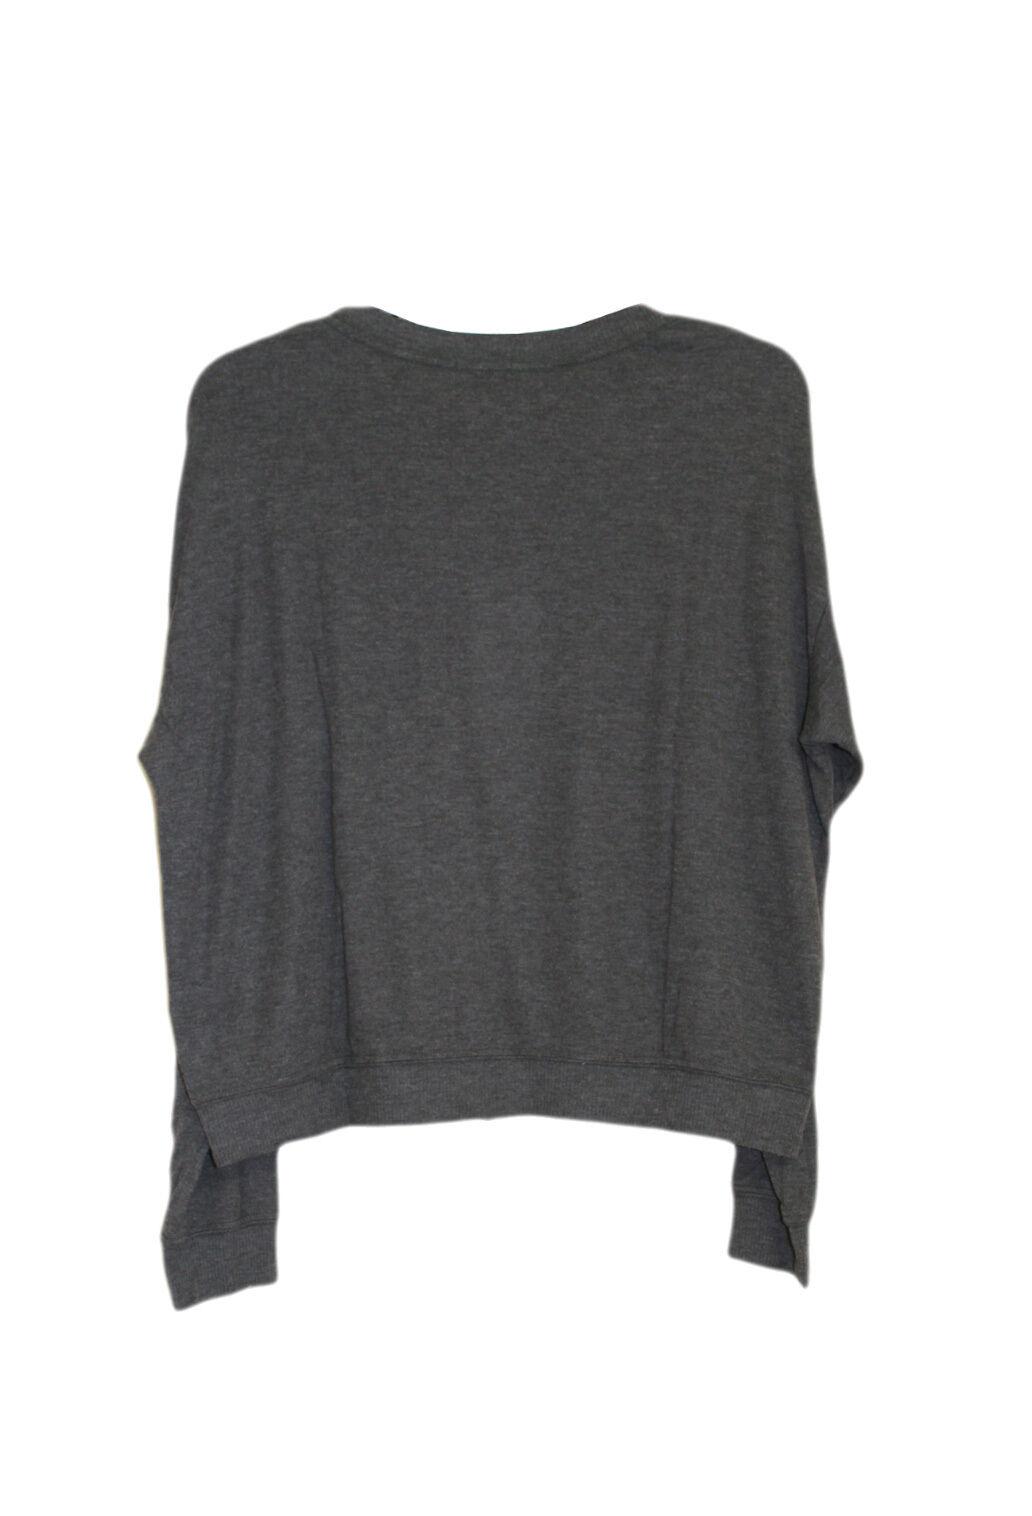 Wildfox Couture Womens Cin Cin Cin Cin Champagne Glass Oversize Sweater Top Tee XS S M L 5b2017